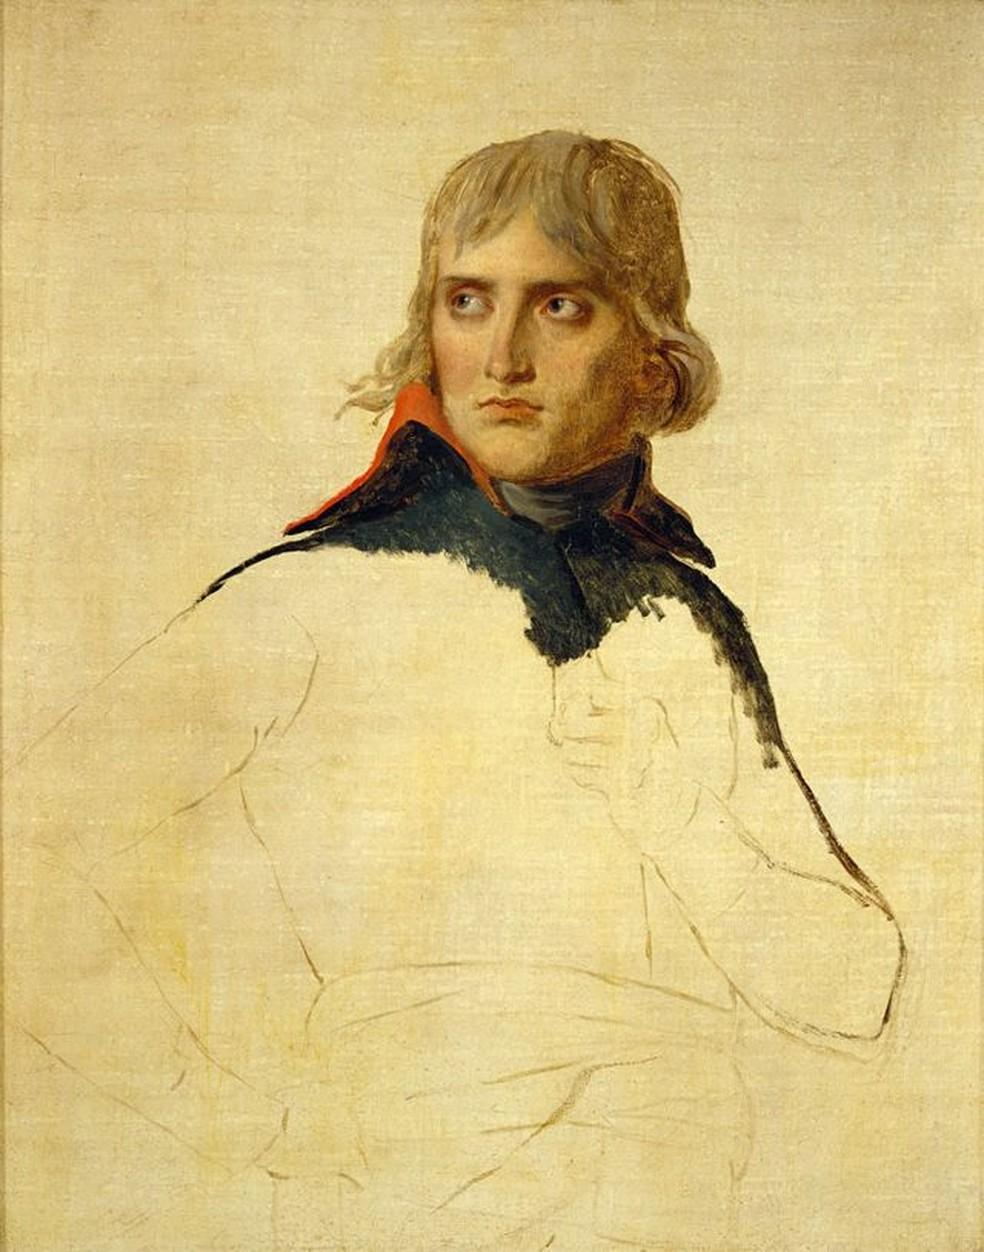 Retrato inacabado de Napoleão feito por Jacques-Louis David — Foto: Getty Images/BBC